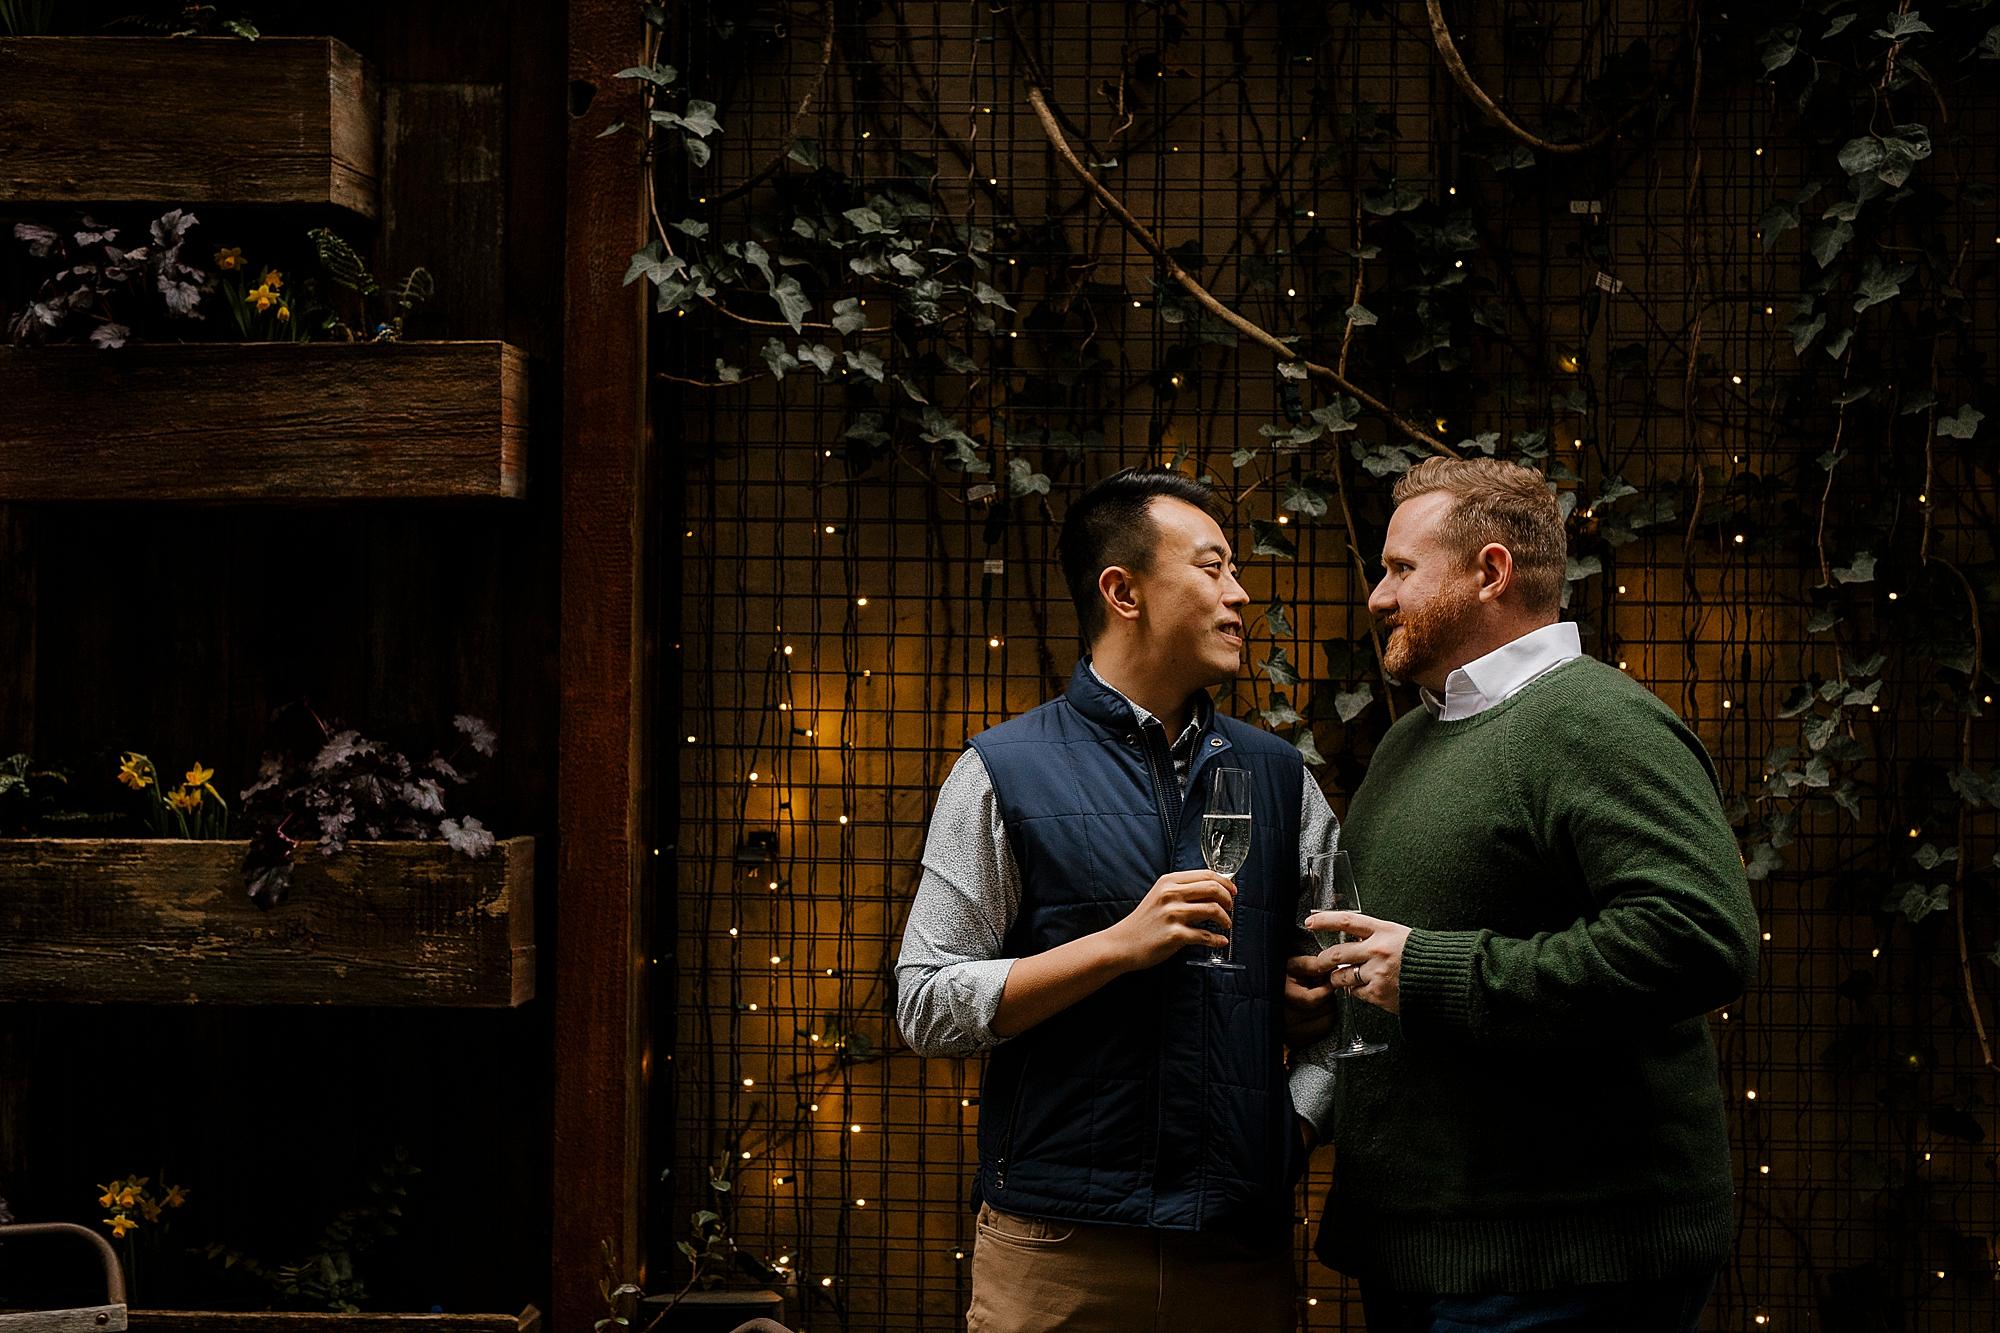 Love_BY_Joe_Mac_Creative_Philadelphia_Philly_Wedding_Photography_Gay_LGBT_Queer_Washington_Square_Park_Philadelphia__0005.jpg